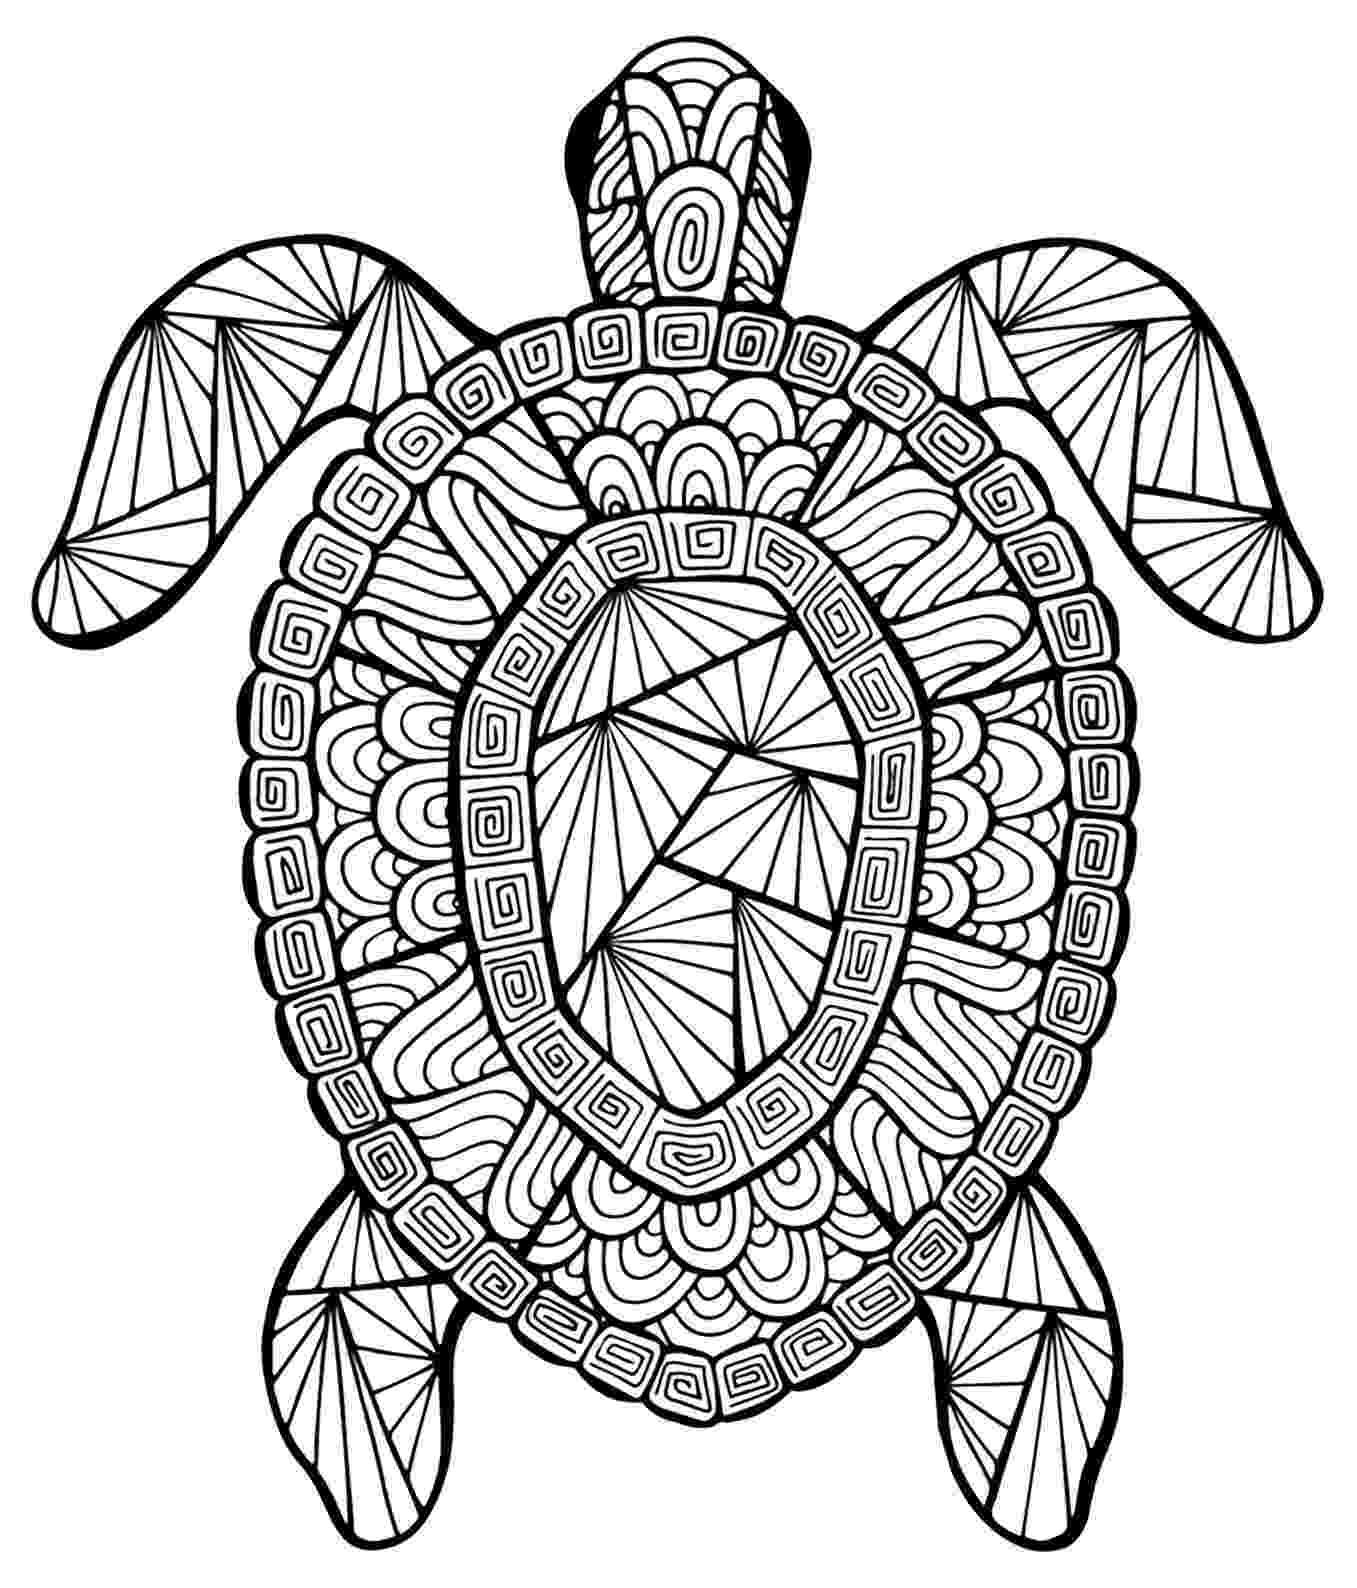 animal mandala color this incredible turtle from the gallery animals mandala animal